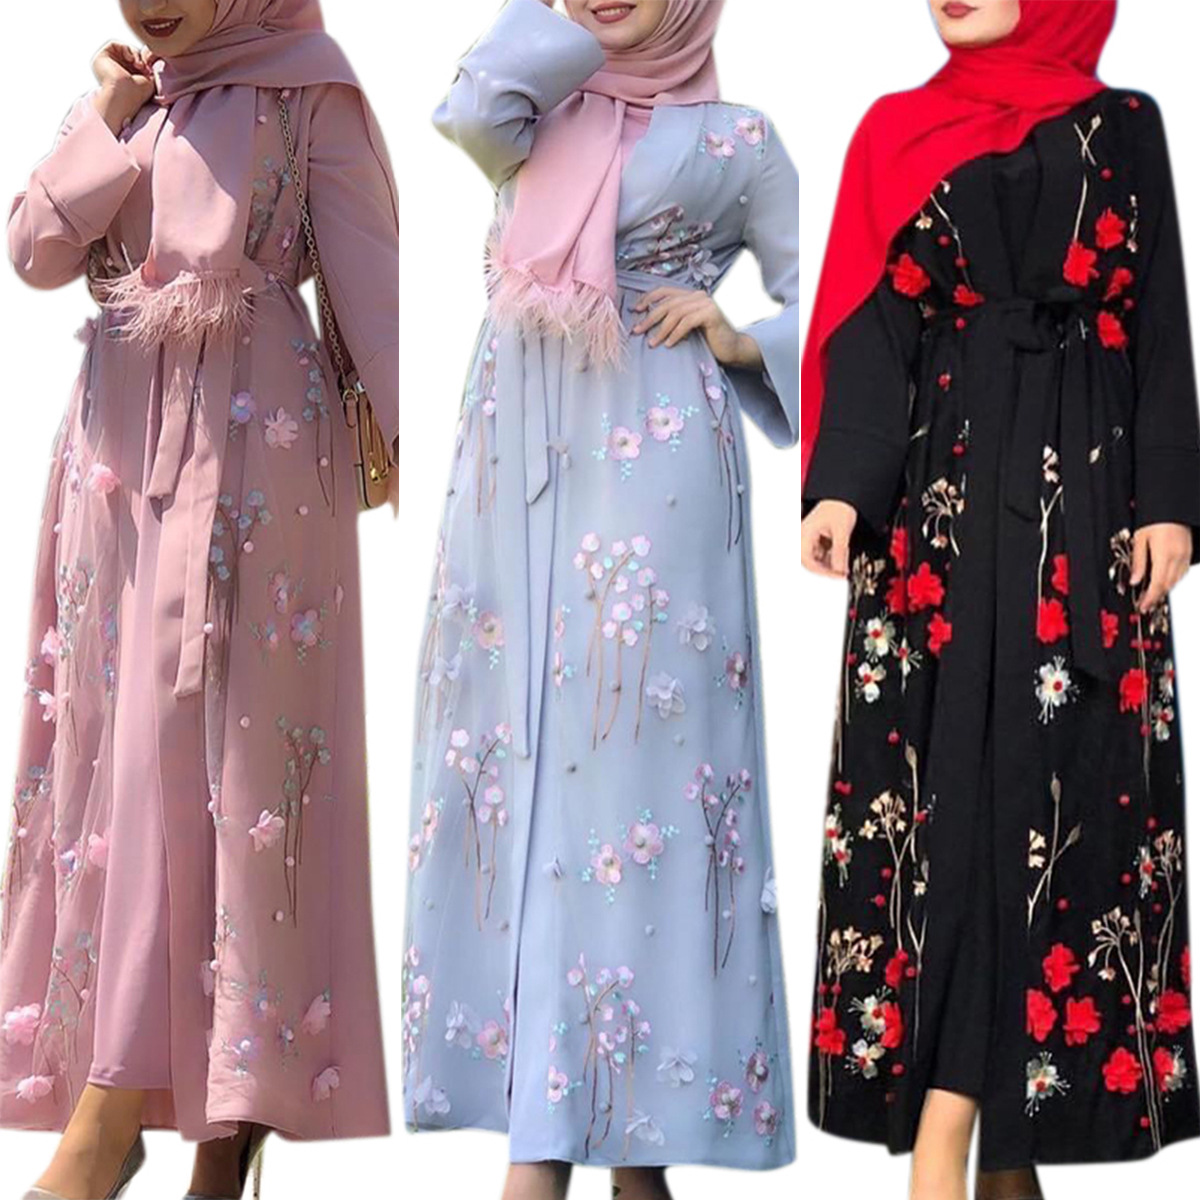 Embroidery Arabic Robe Dubai Abaya Islam Muslim Hijab Dress for Women Fashion Kimono Kaftan Caftan Islamic Clothing Hicap Elbise